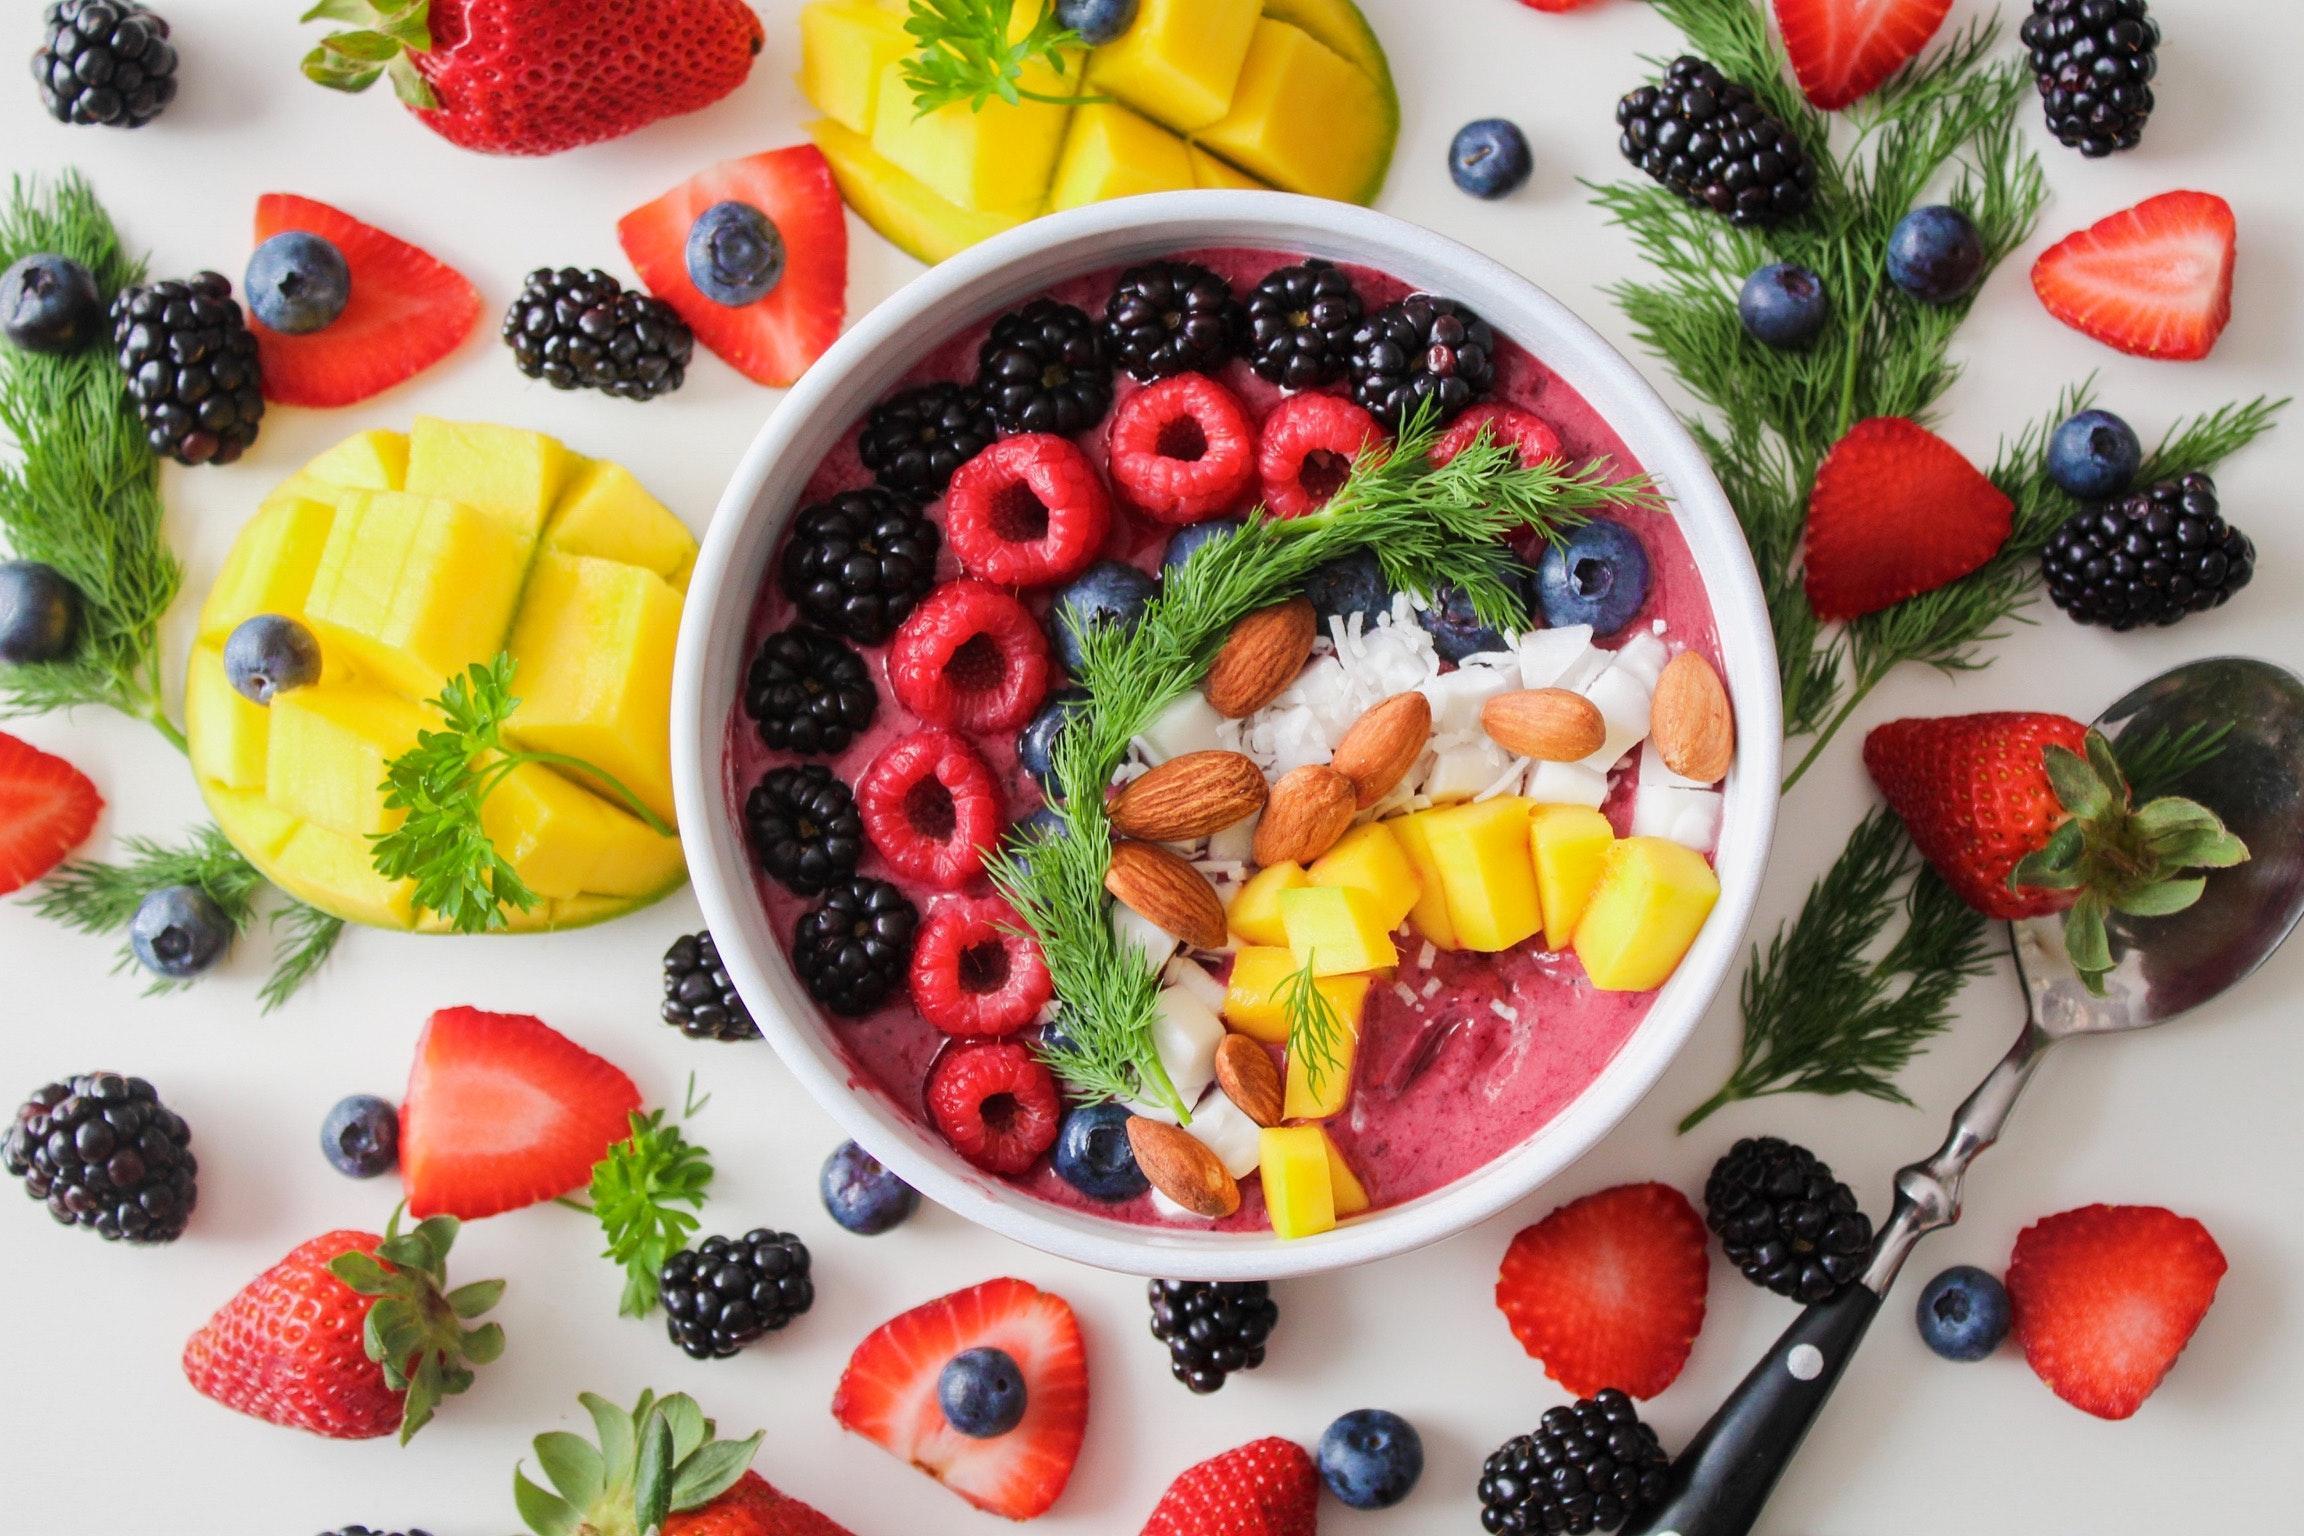 berry-acai-bowl-1532035848583-1532035851080.jpg